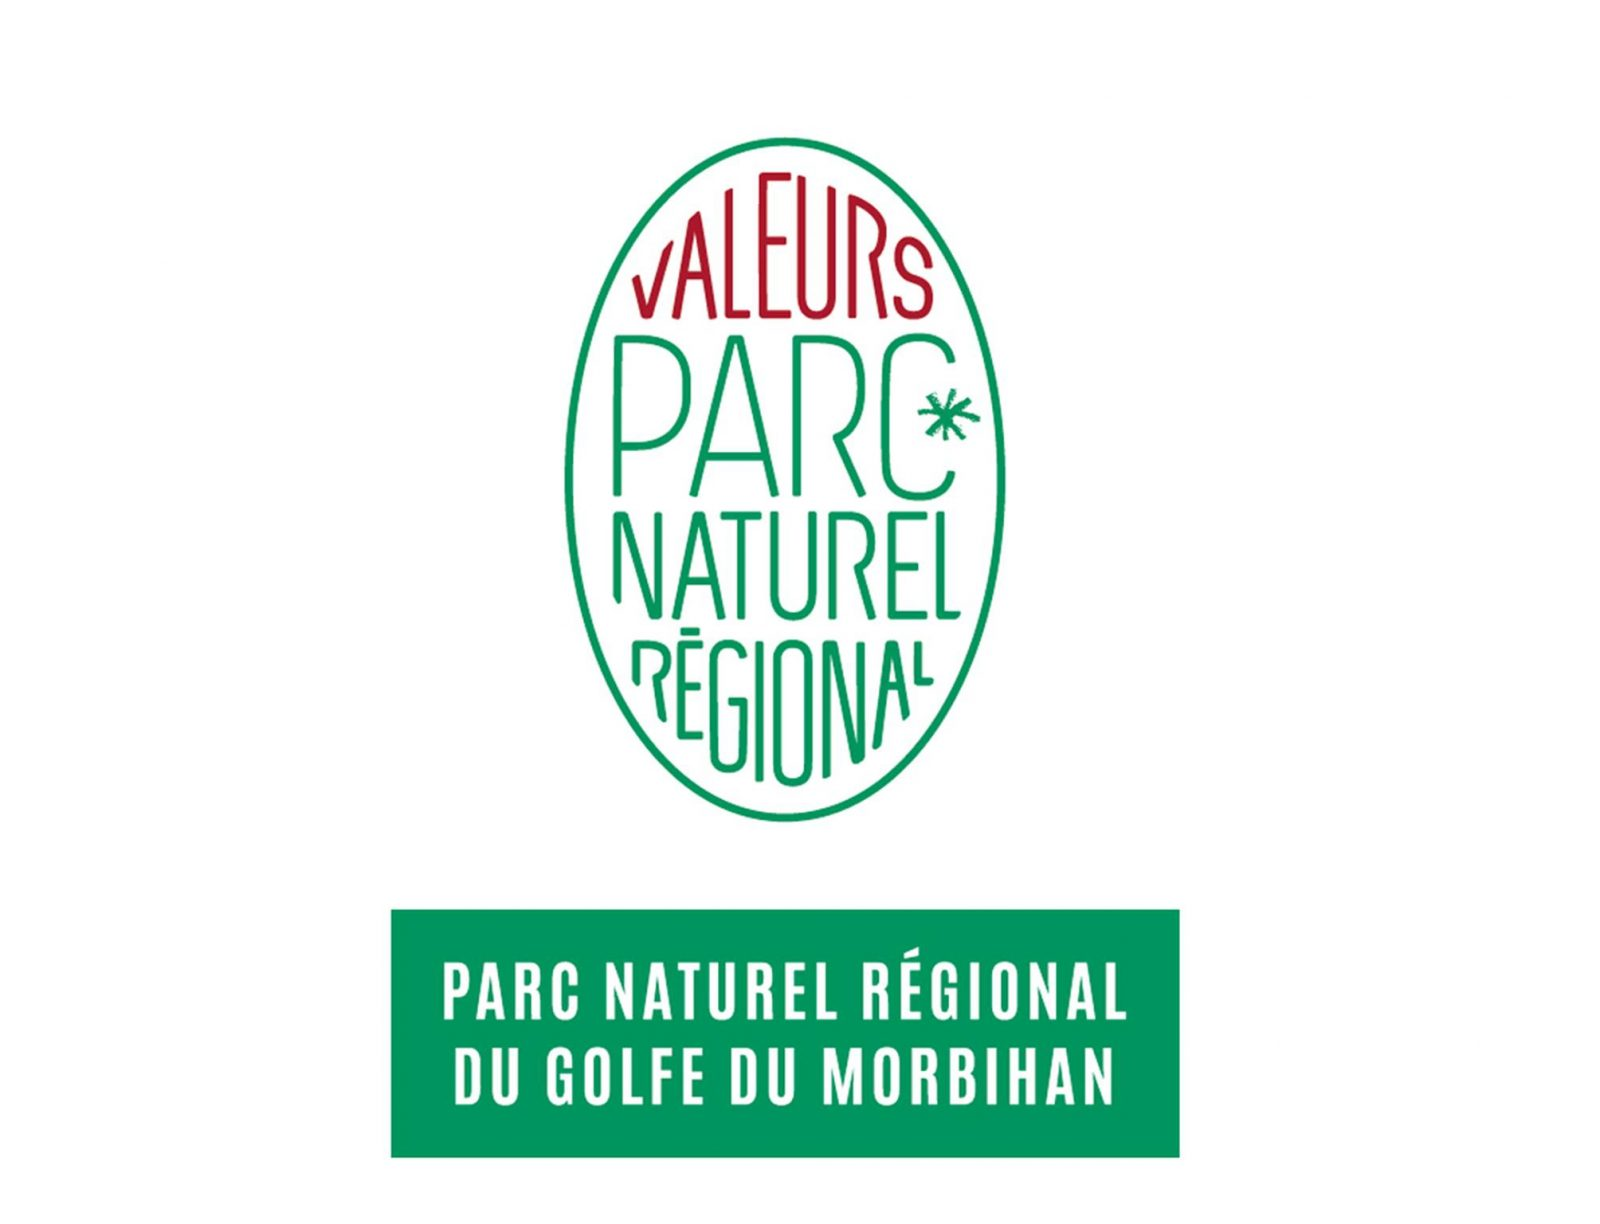 Logo-Valeurs-Parc-Naturel-Régional-du-Golfe-du-Morbihan-Bretagne sud